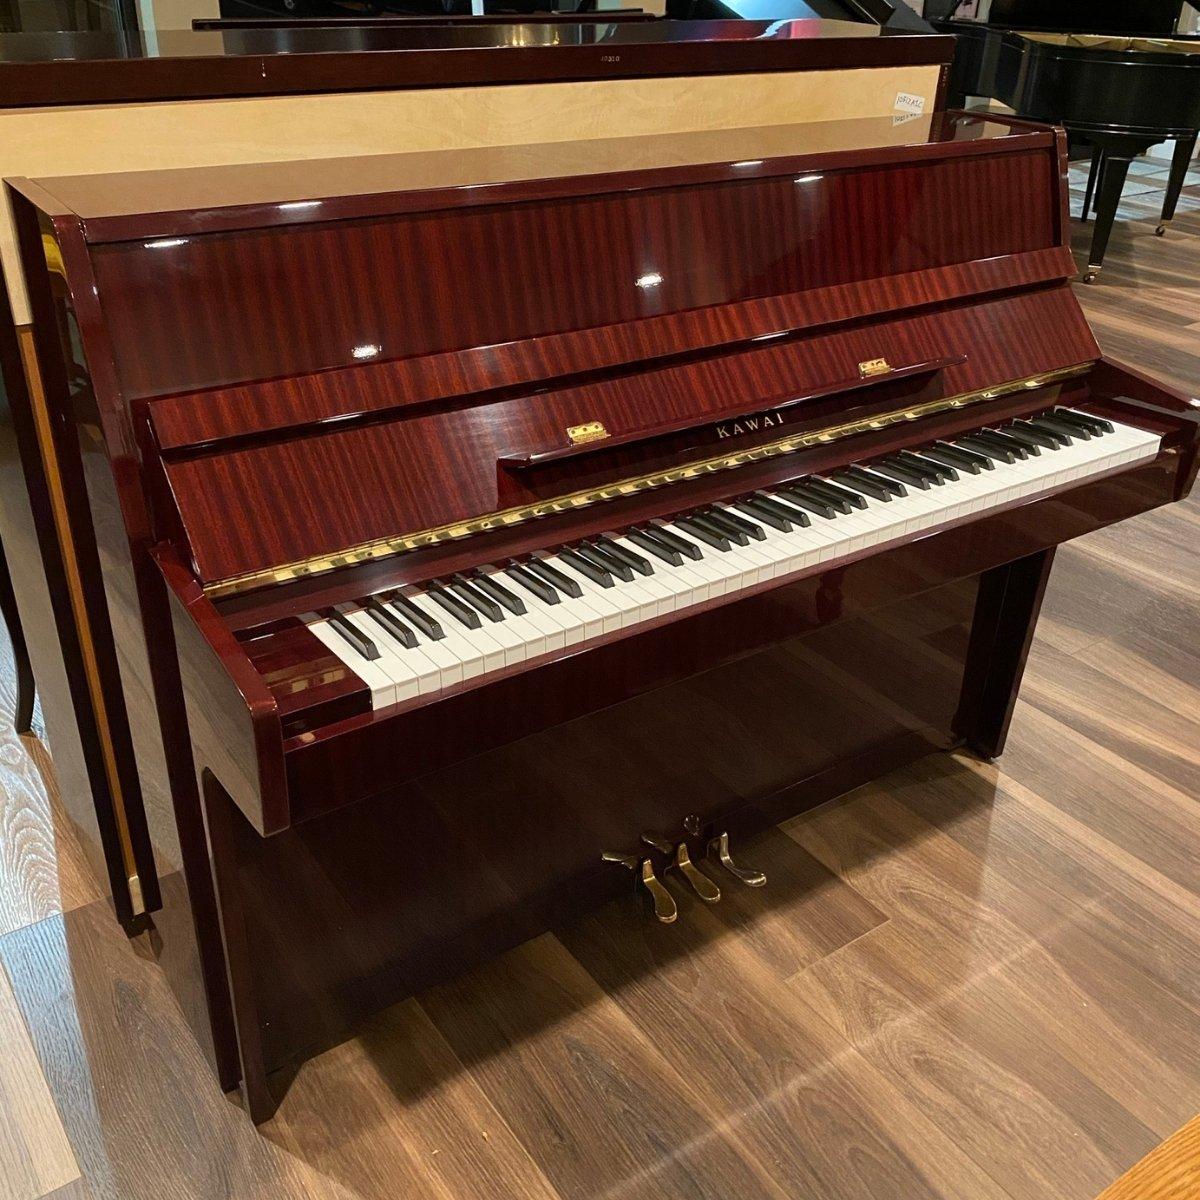 RENTED - Kawai 43 1CE-7N Upright Piano